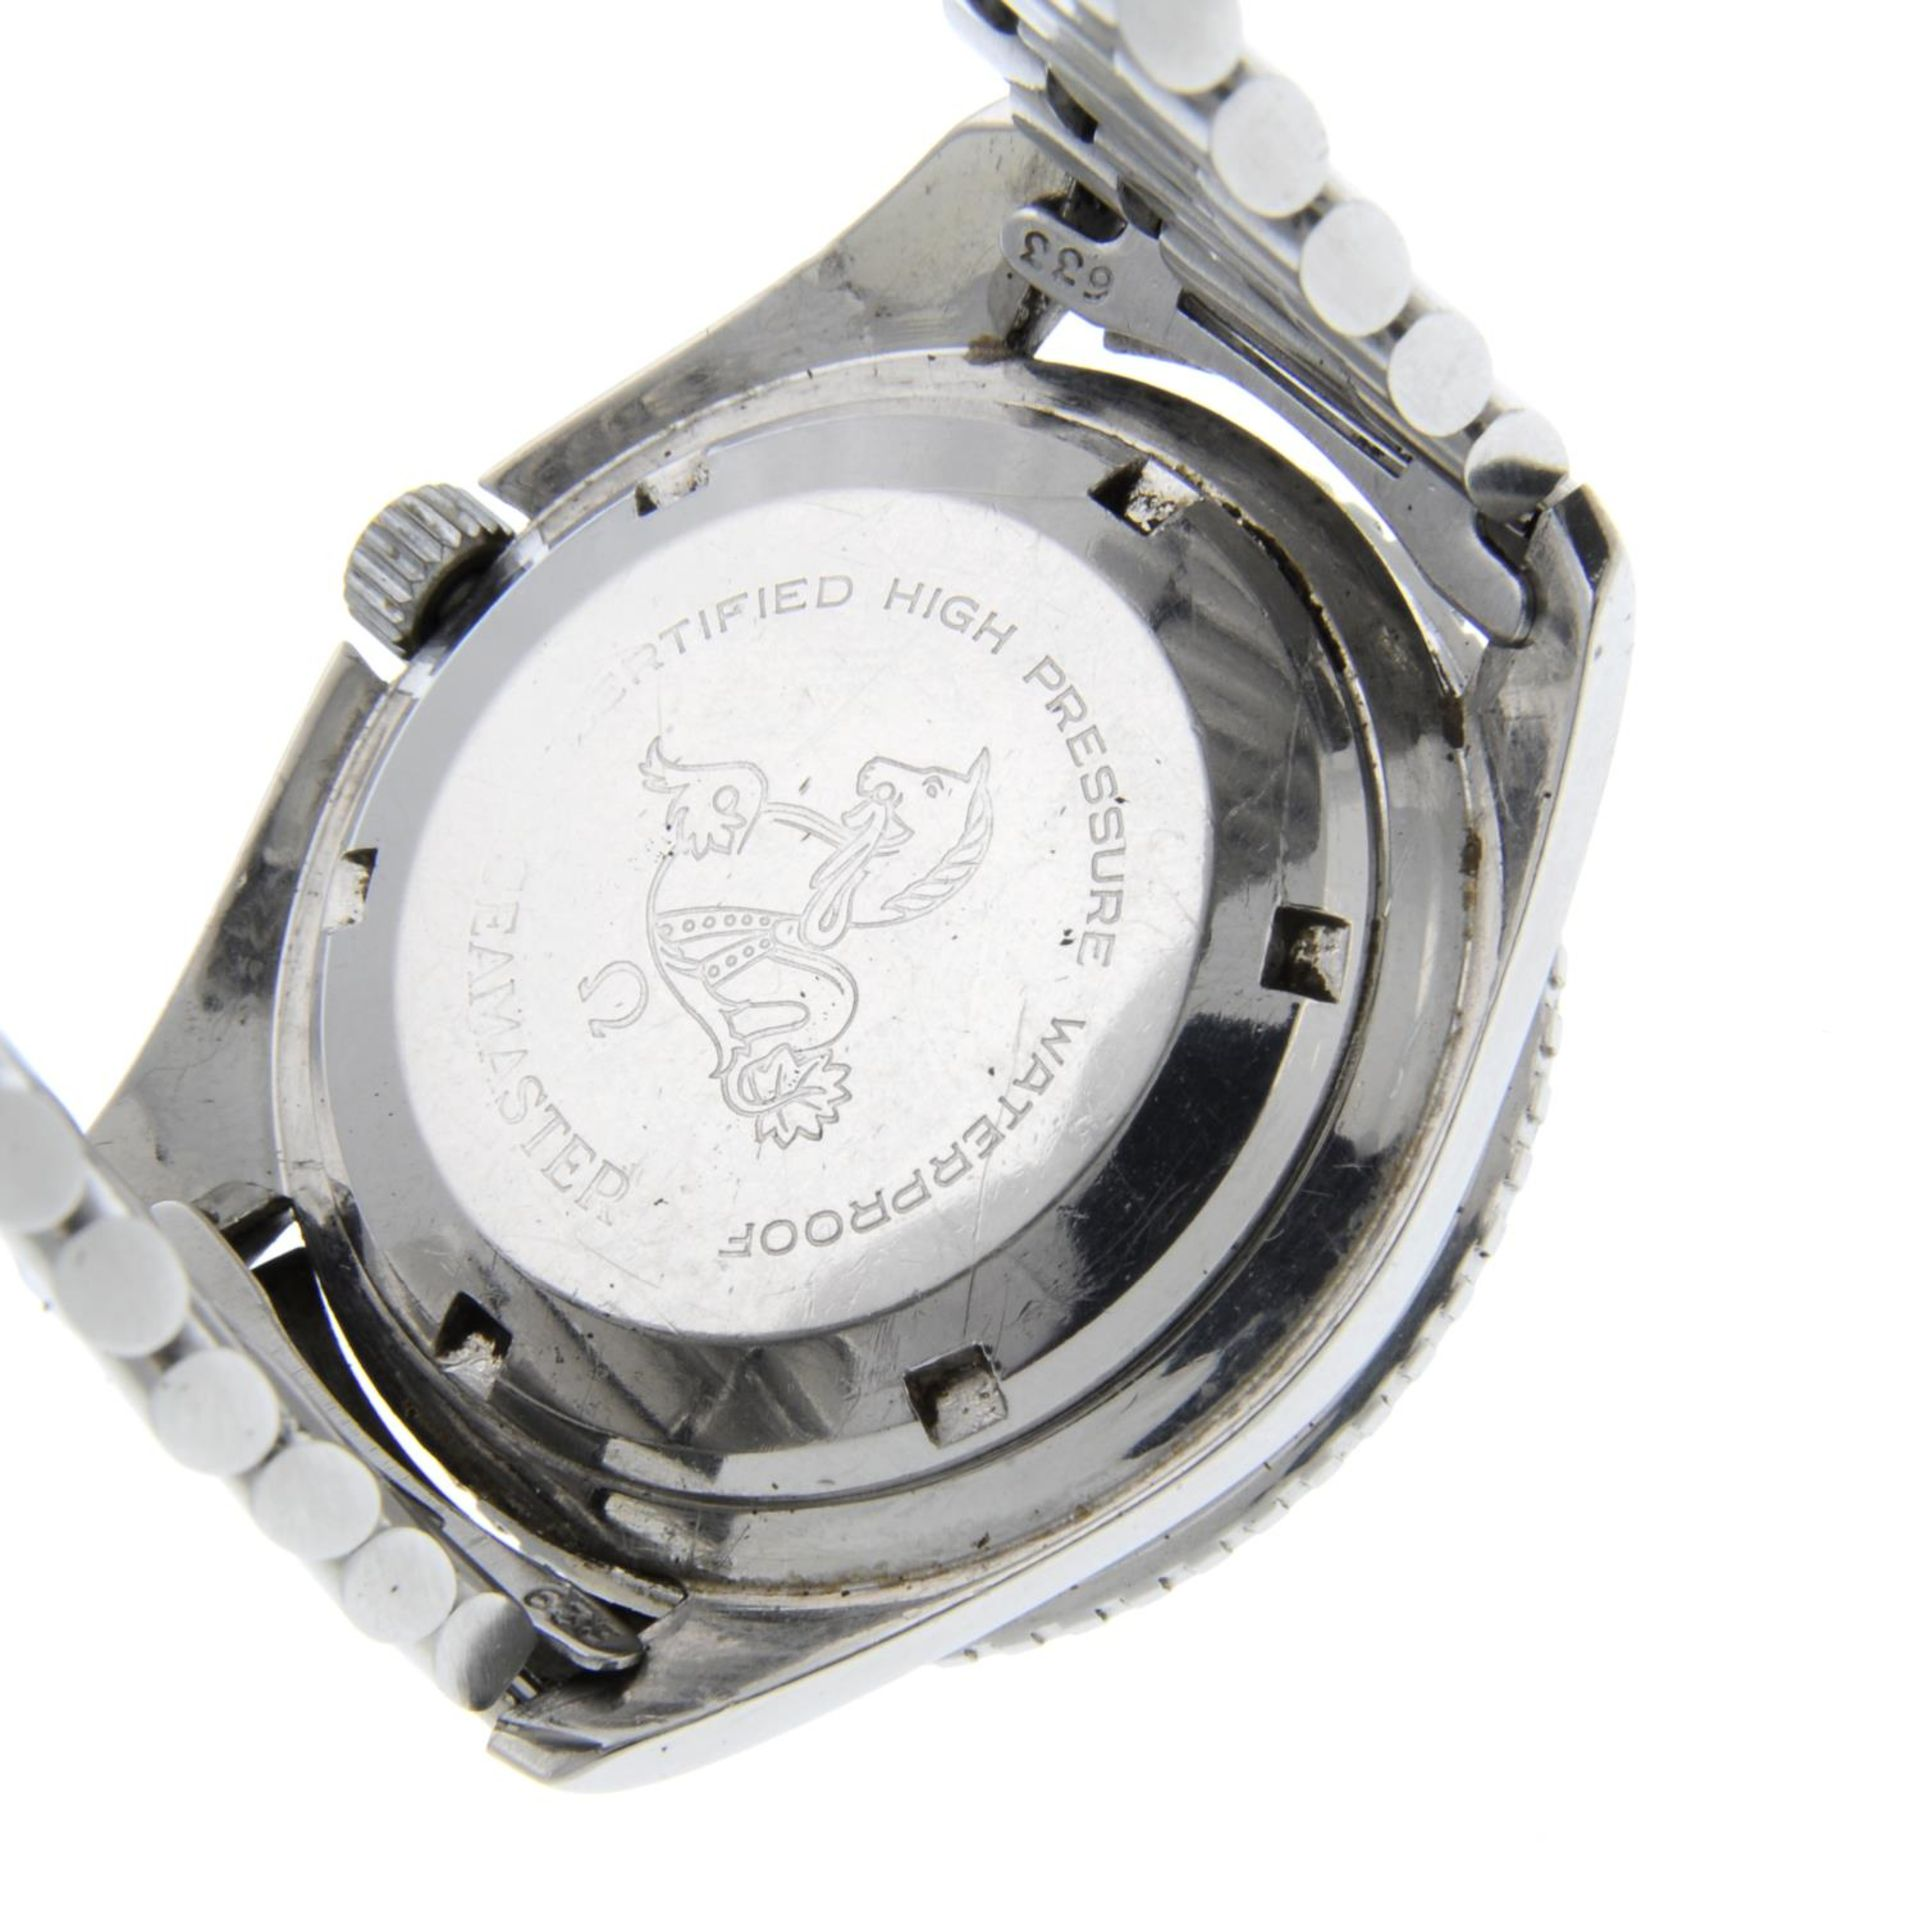 OMEGA - a Seamaster 300 'Big Triangle' bracelet watch. - Bild 4 aus 4